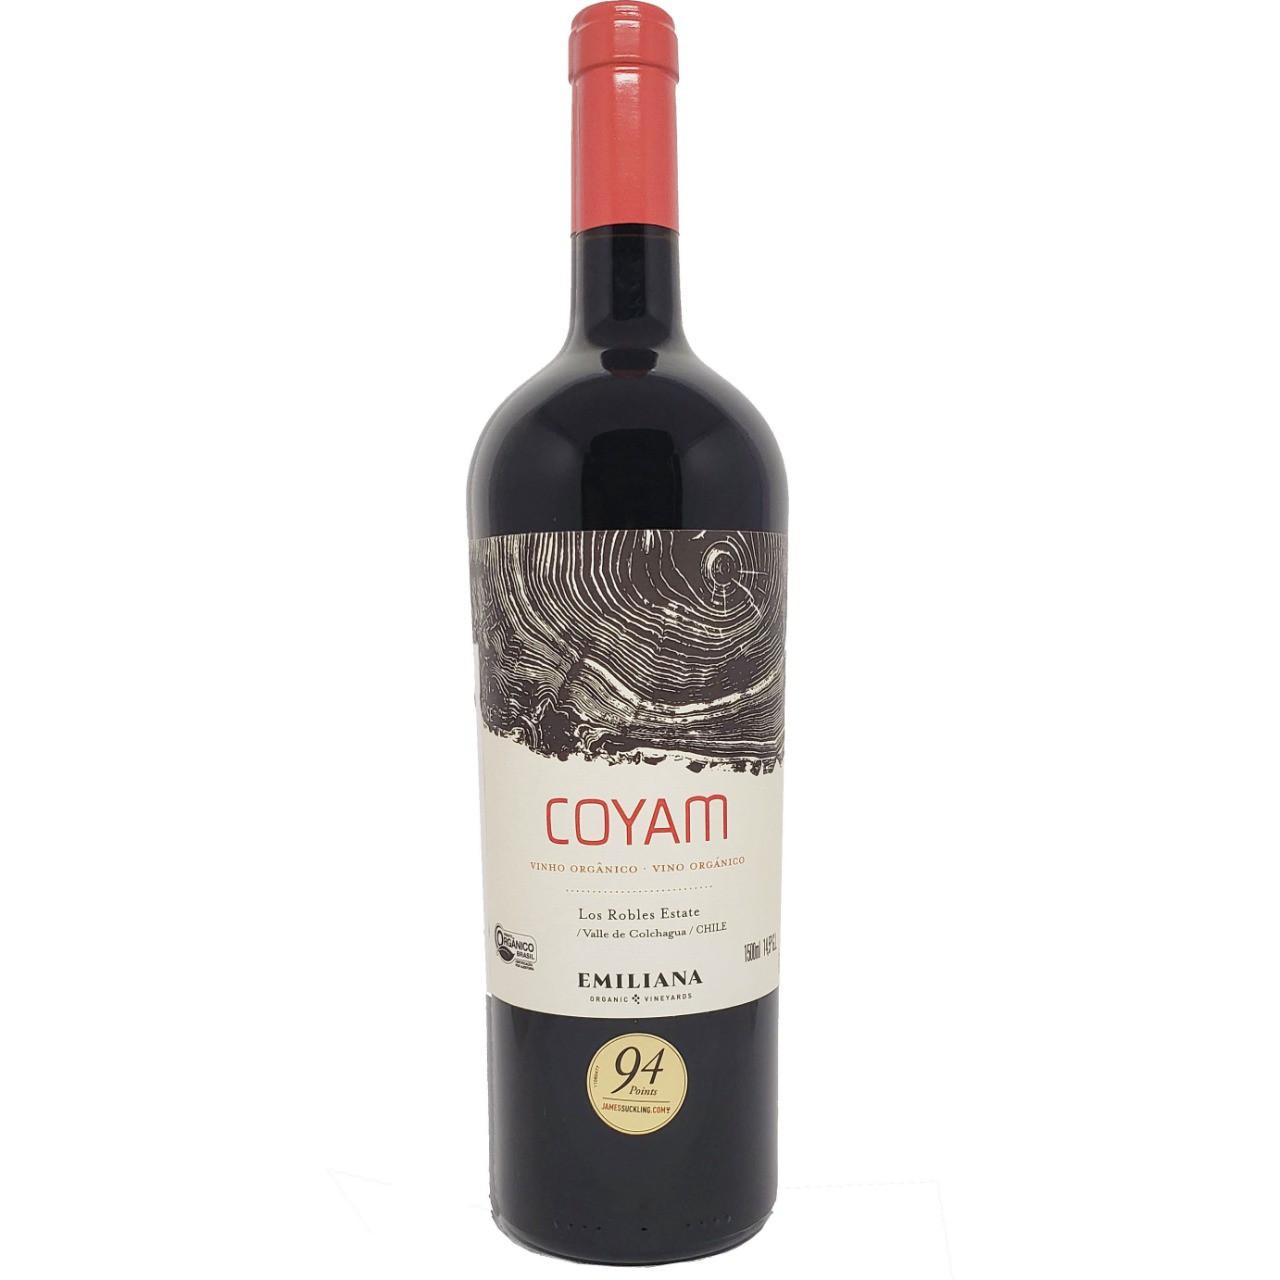 Vinho Tinto Orgânico Coyam Los Robles Estate Emiliana - 1,5L -